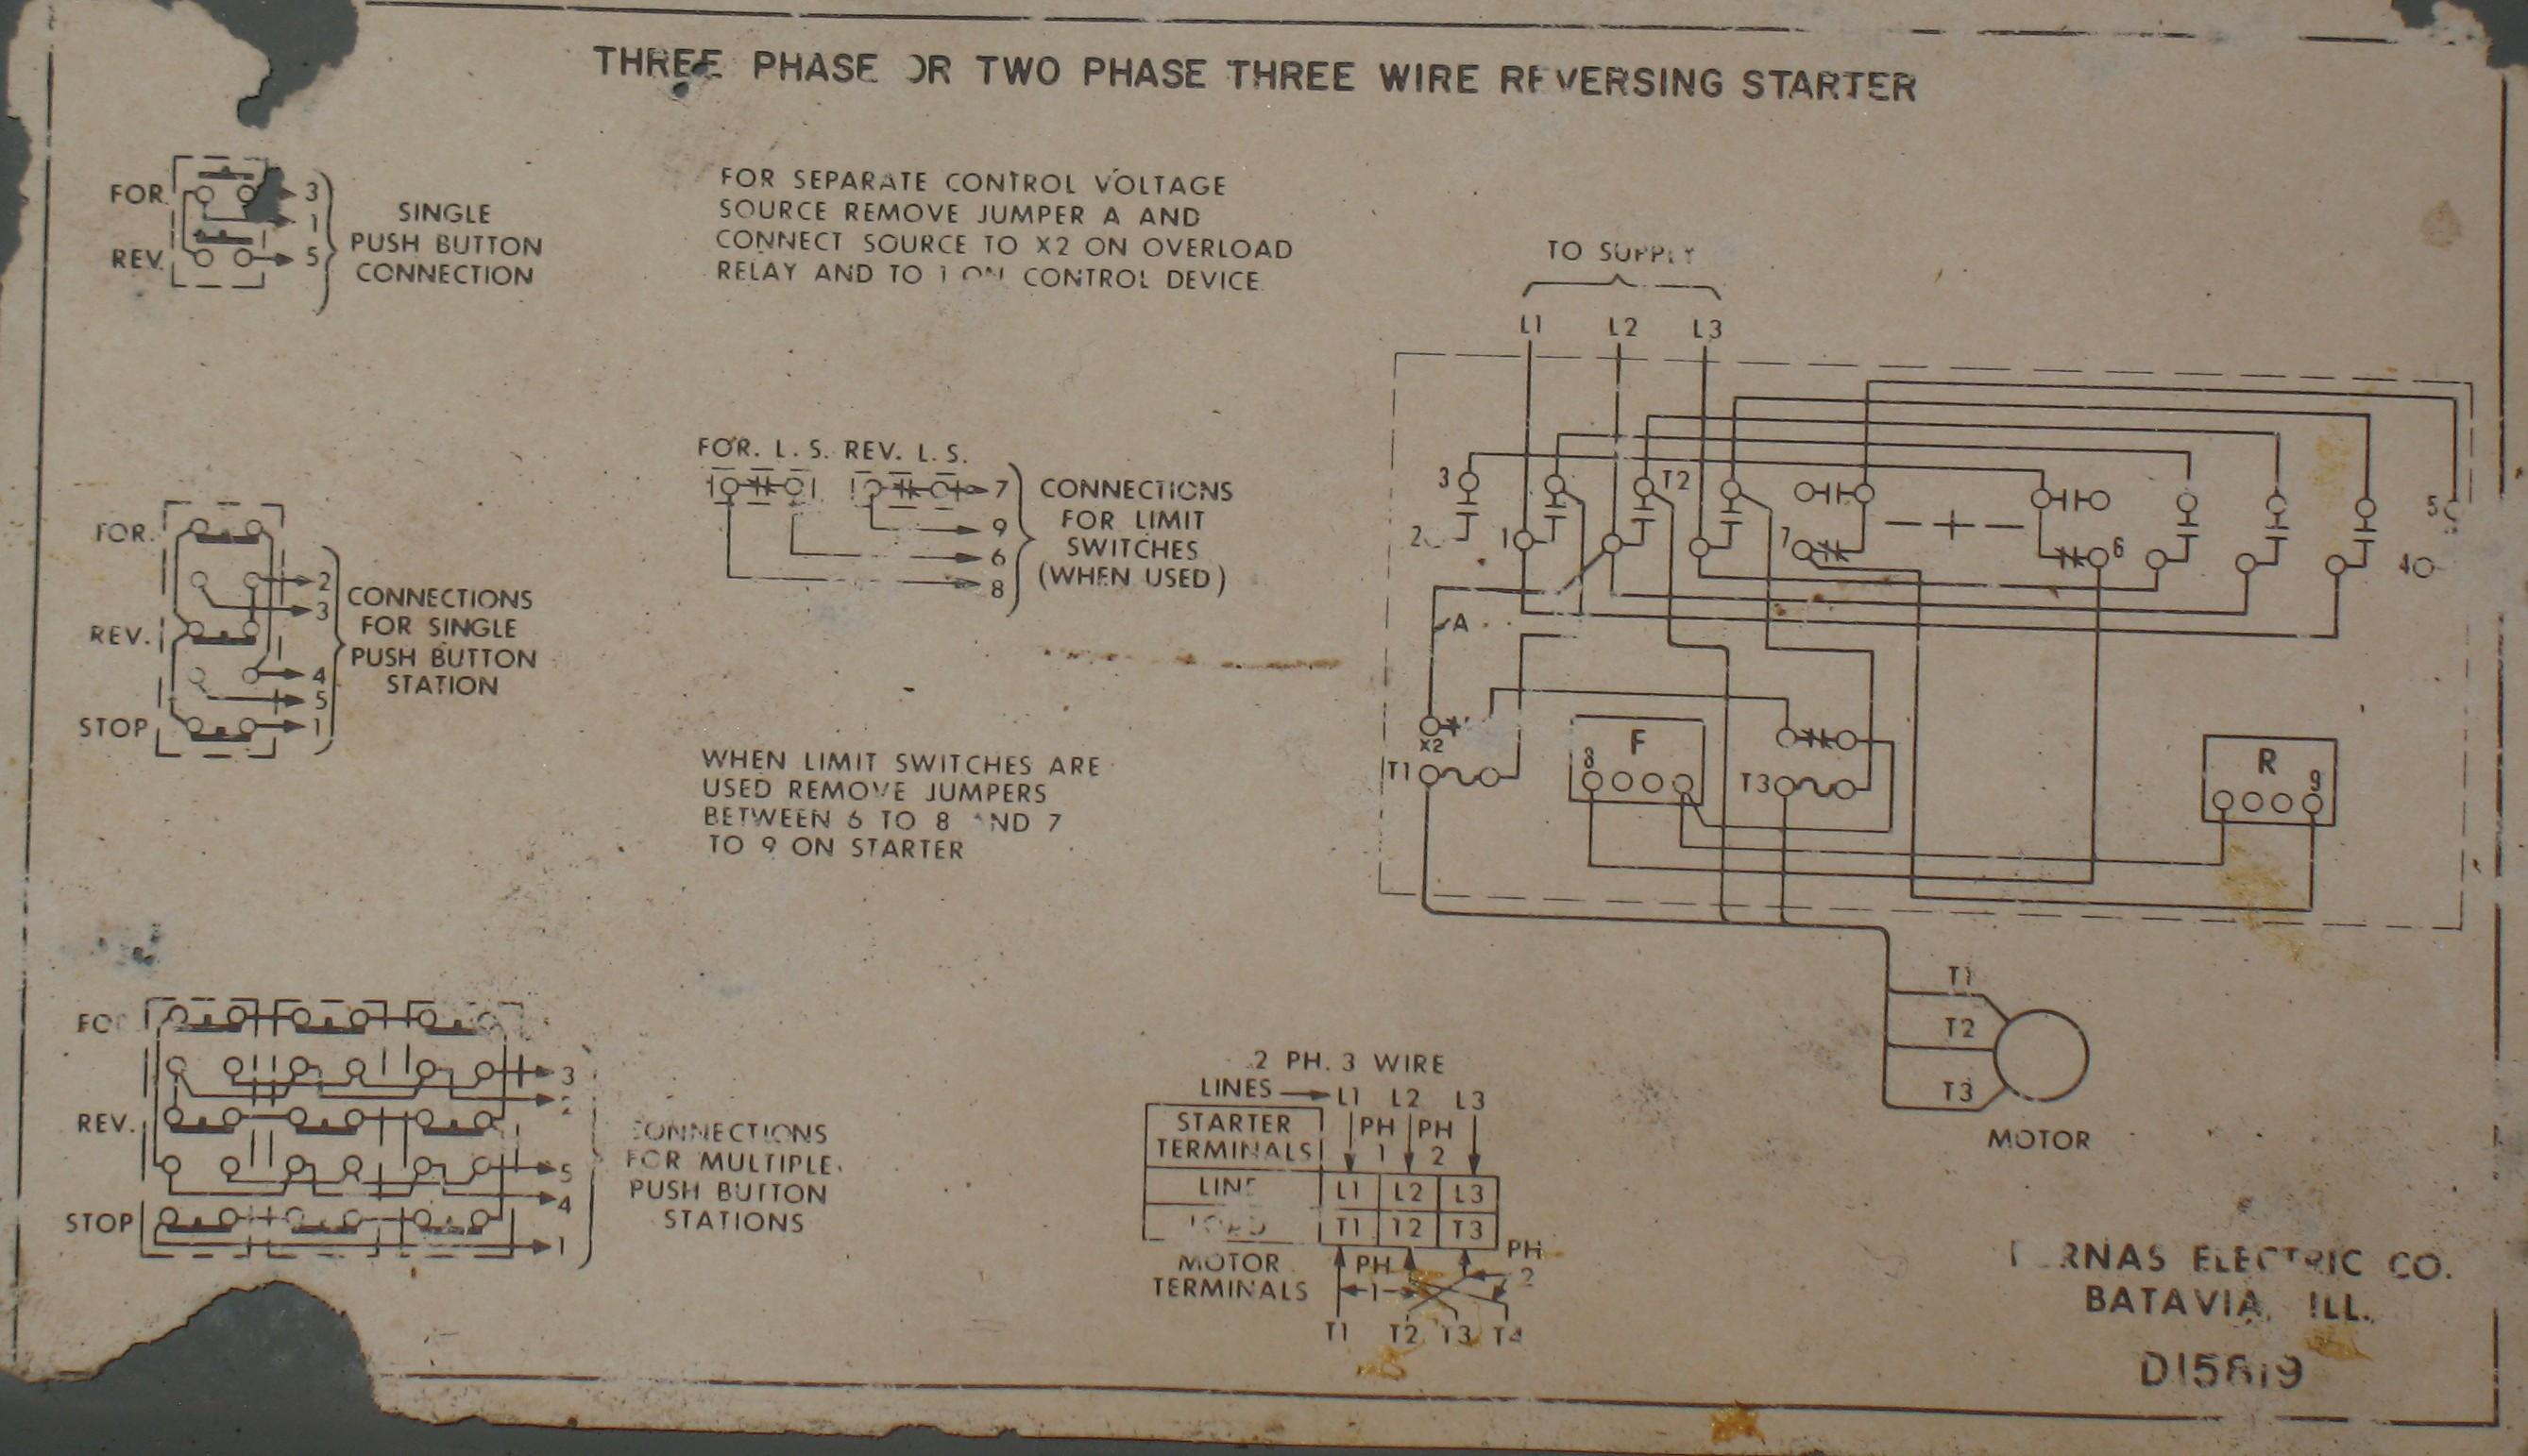 doerr electric motor wiring diagram pid temperature controller compressor lr22132 garage door